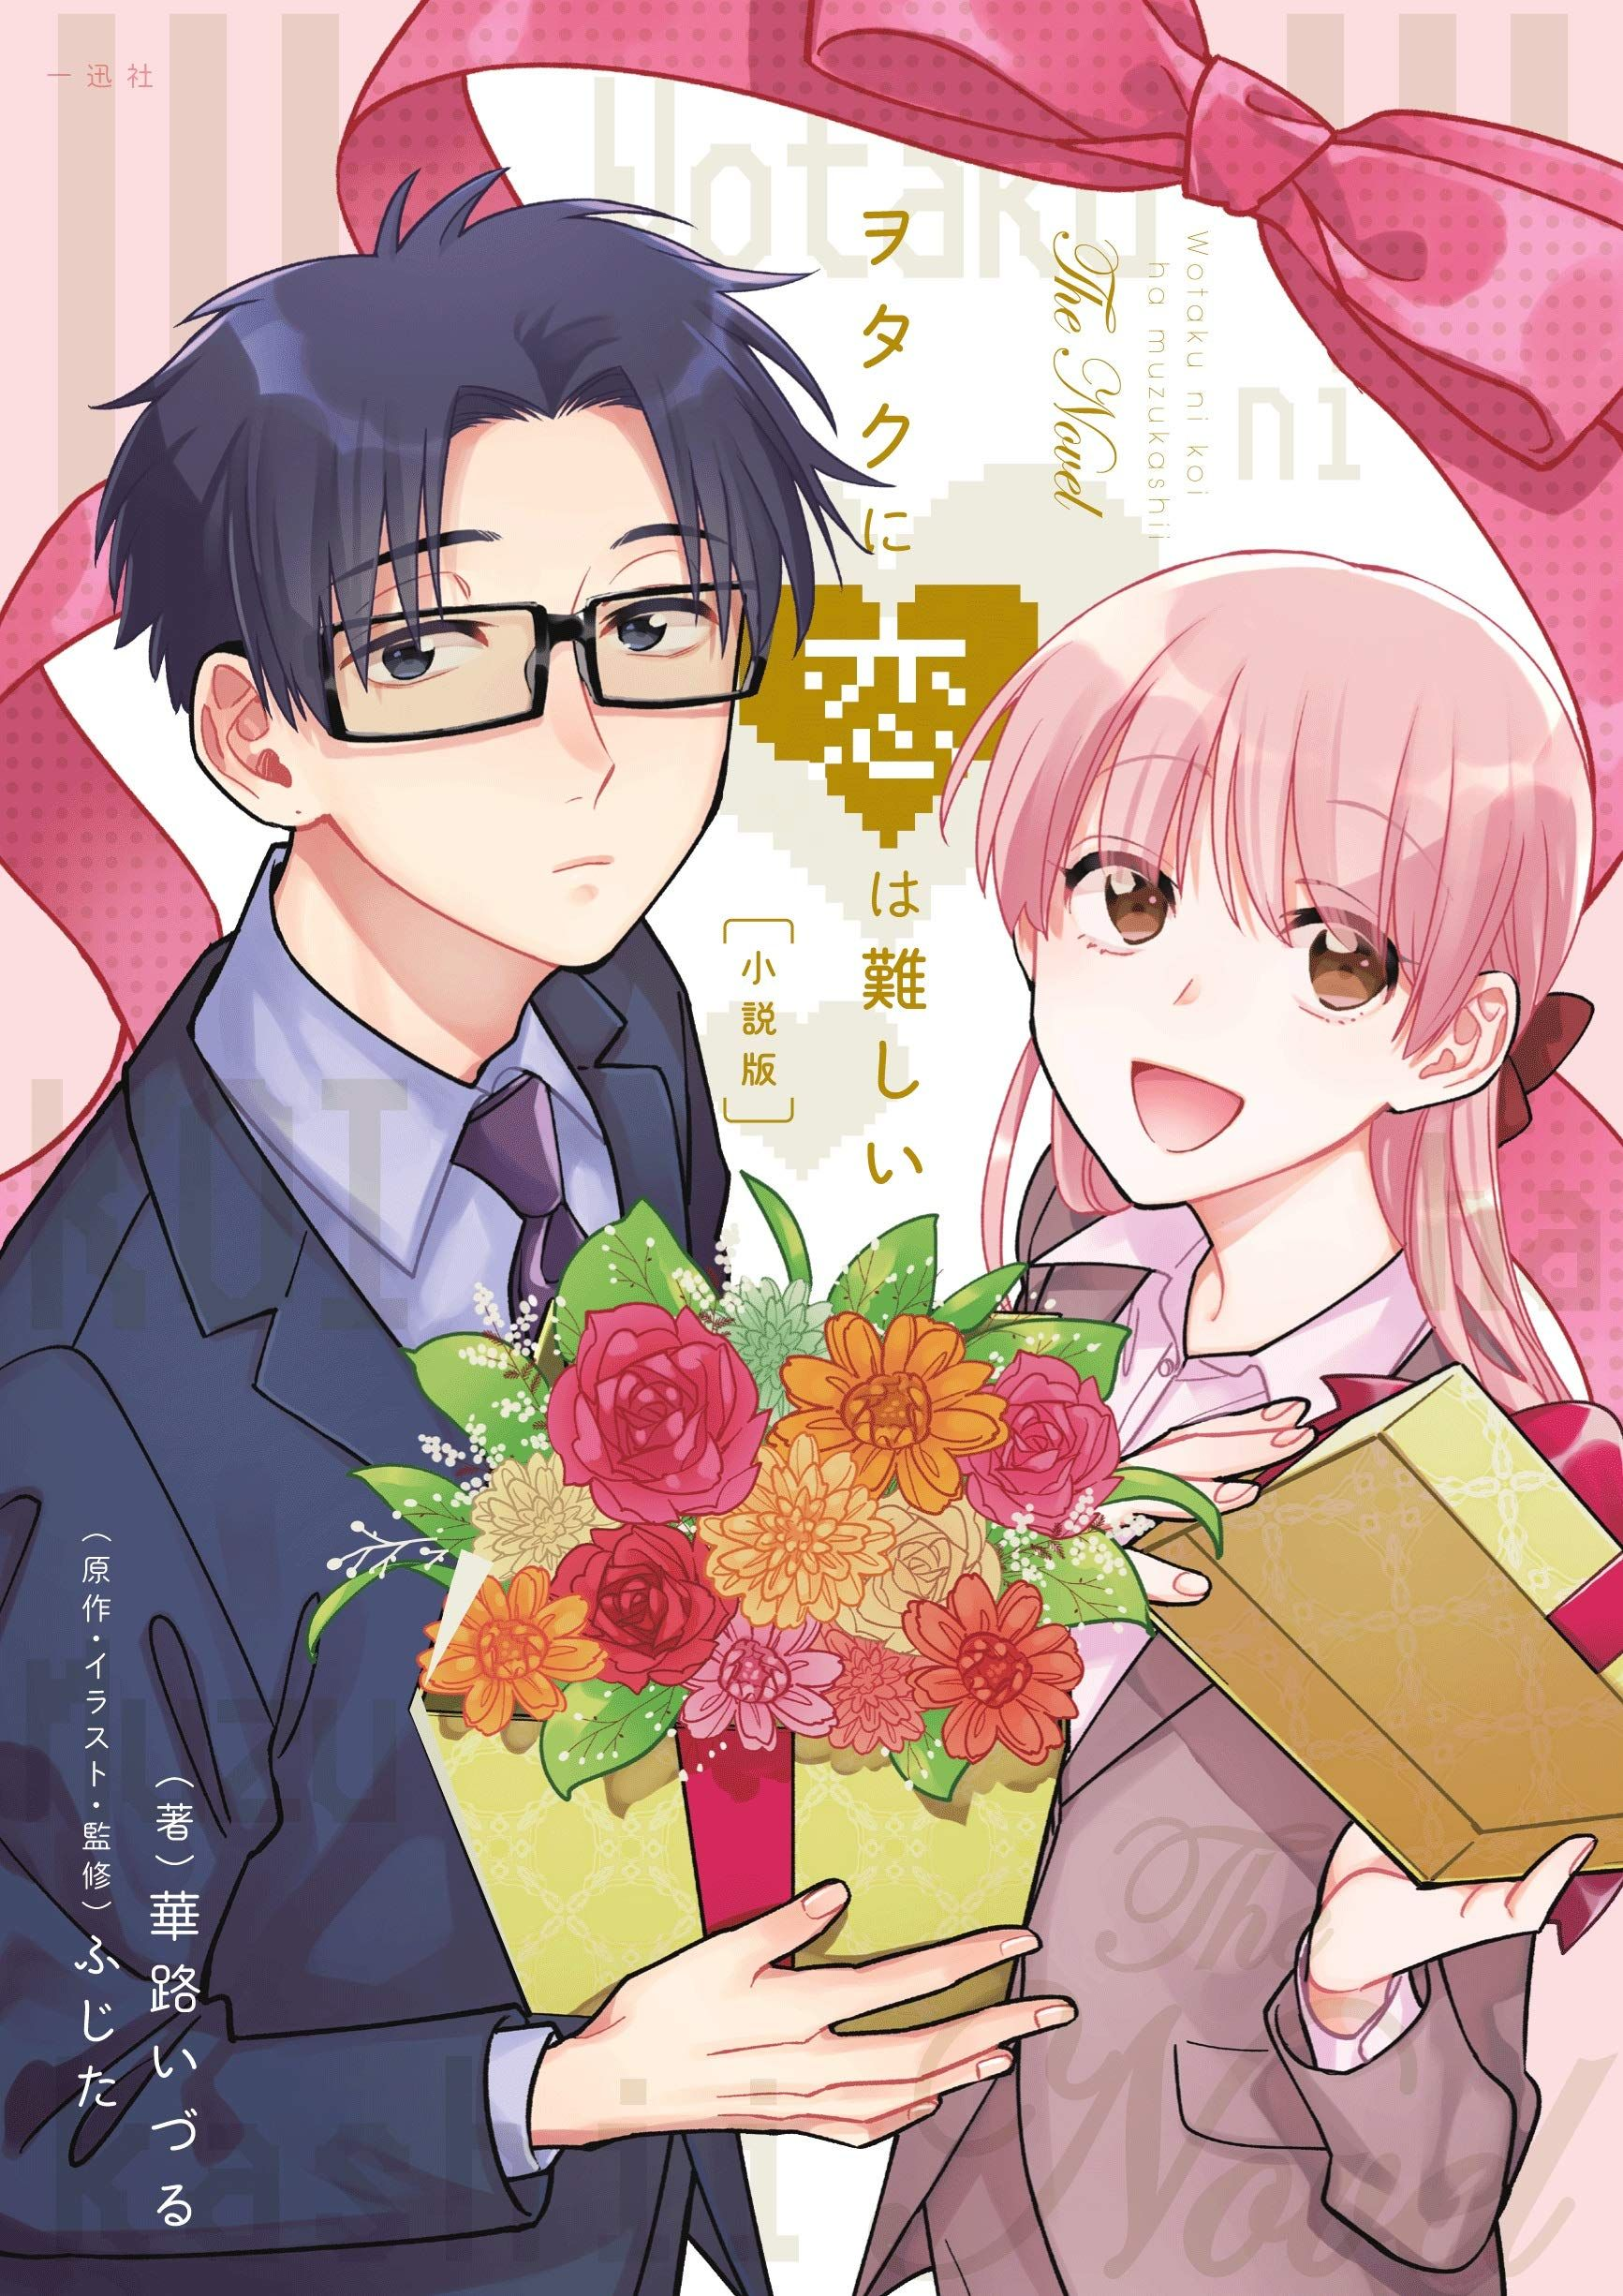 Japan Top 10 Weekly Light Novel Ranking: January 27, 2020 ~ February 2, 2020